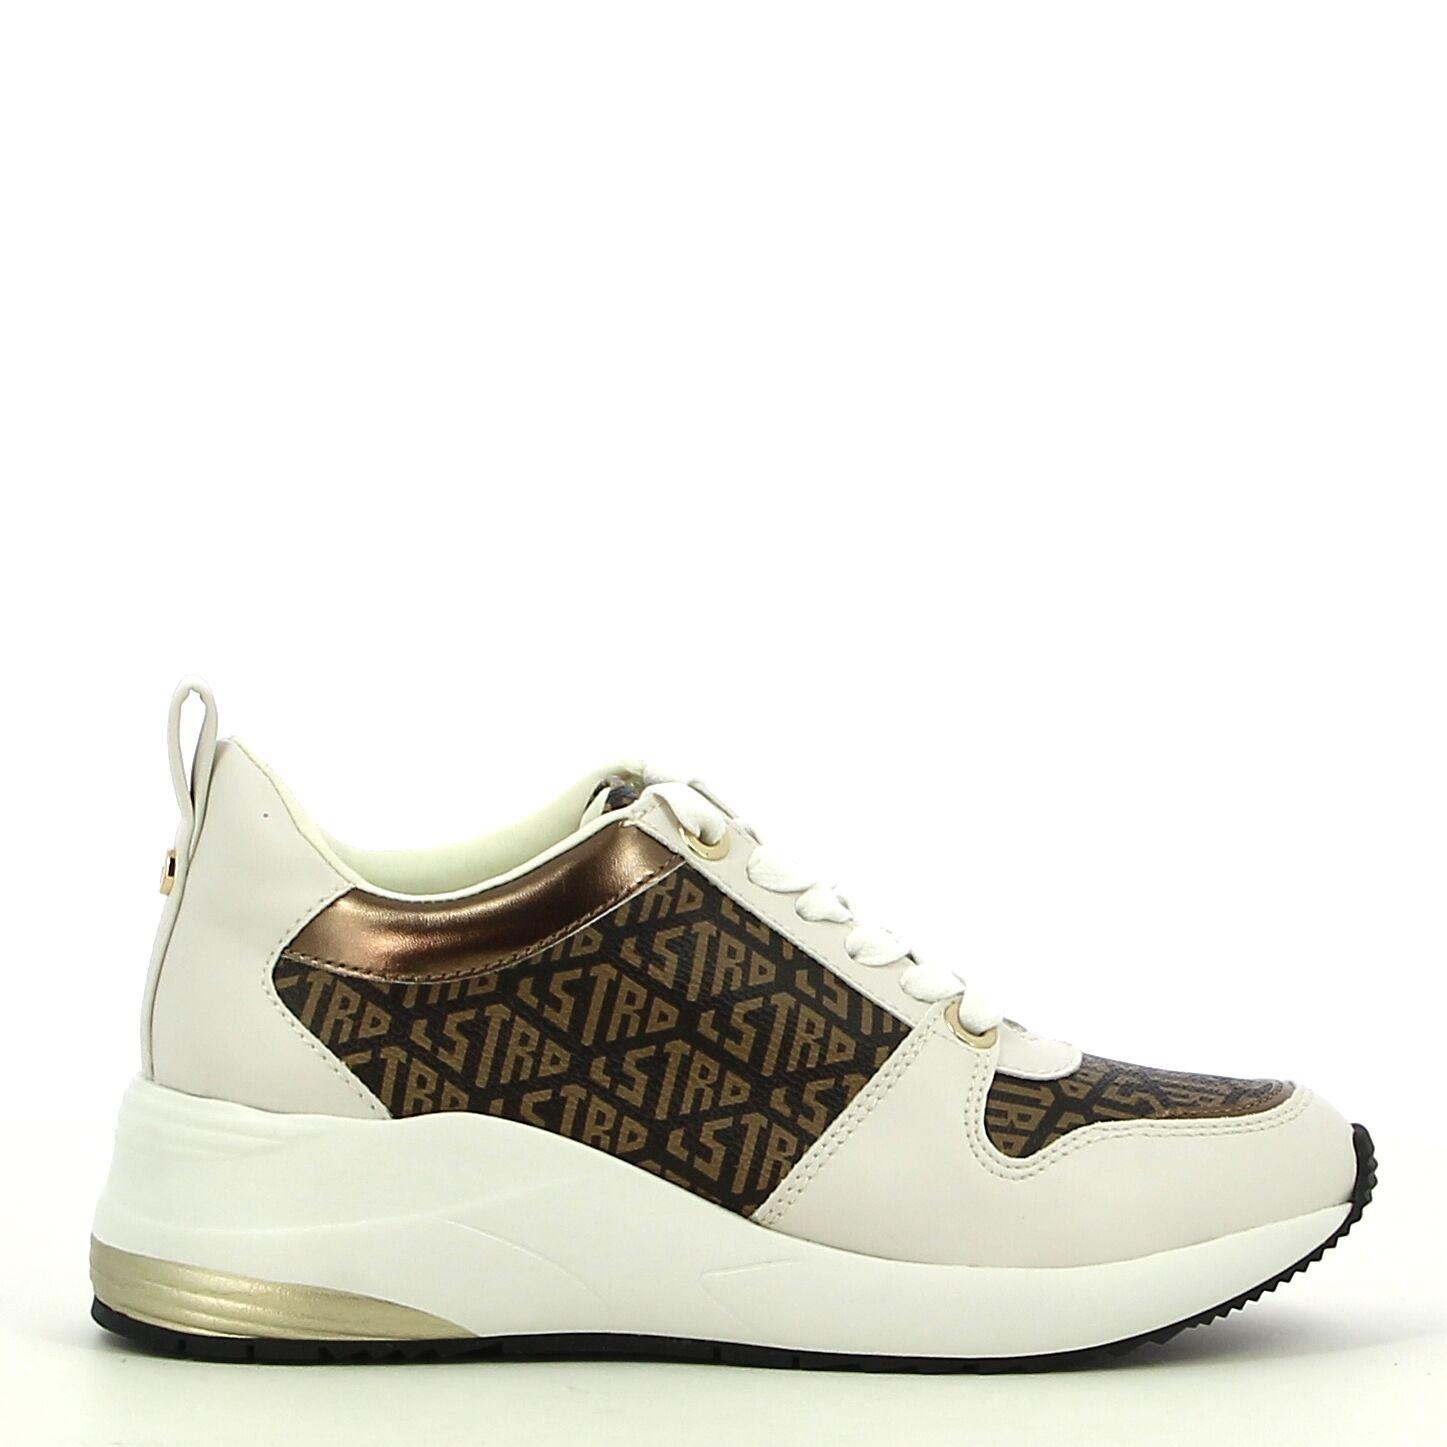 La Strada - Wit/Bruin - Sneakers